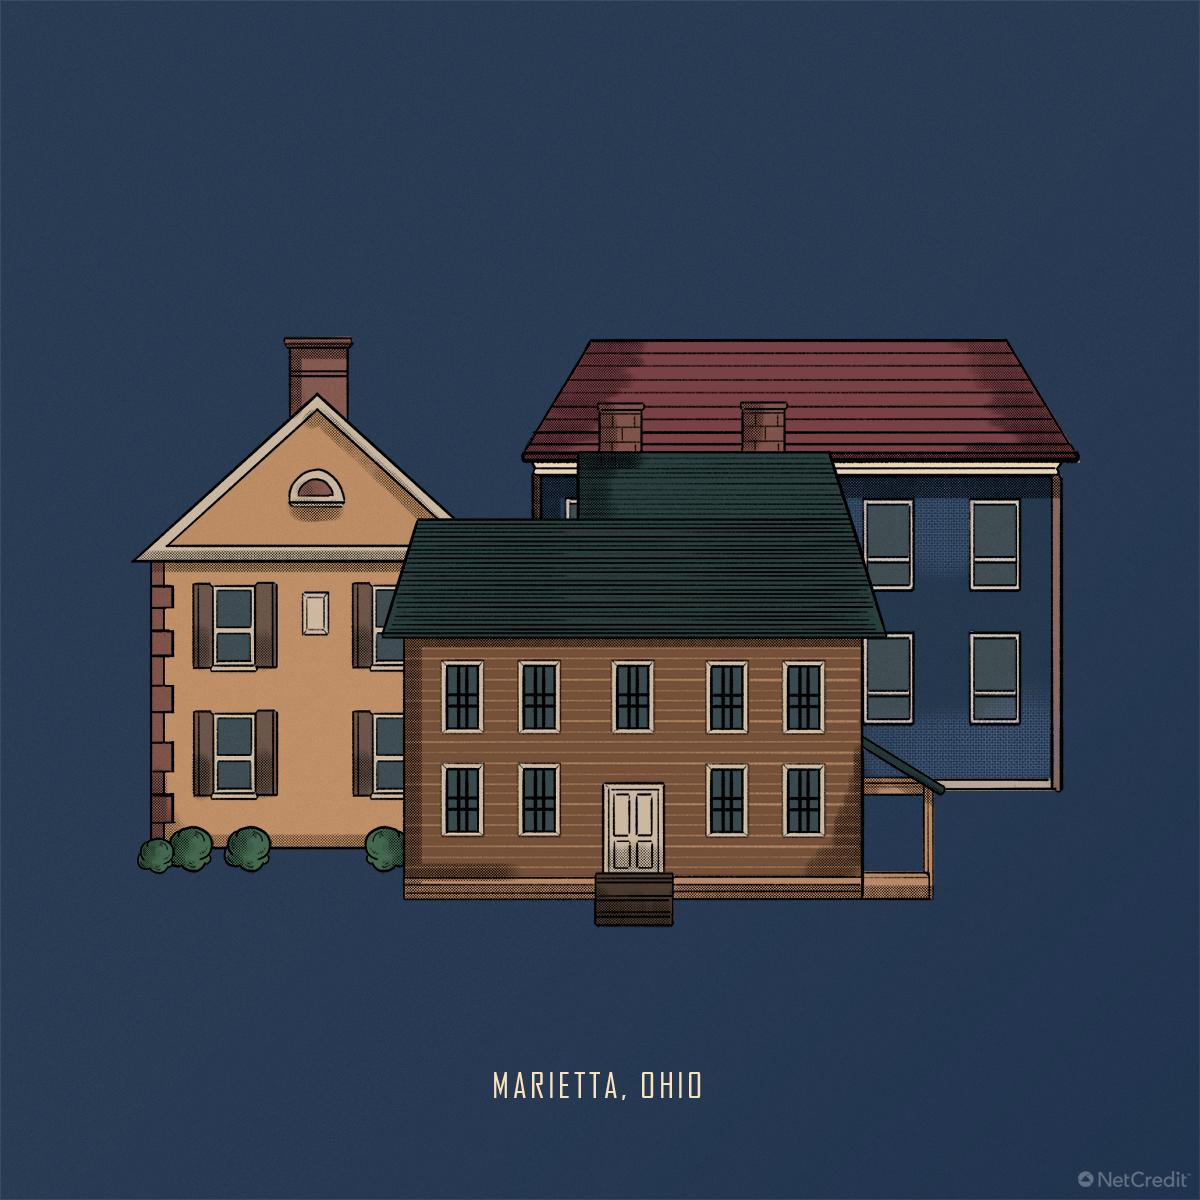 Marietta, Ohio